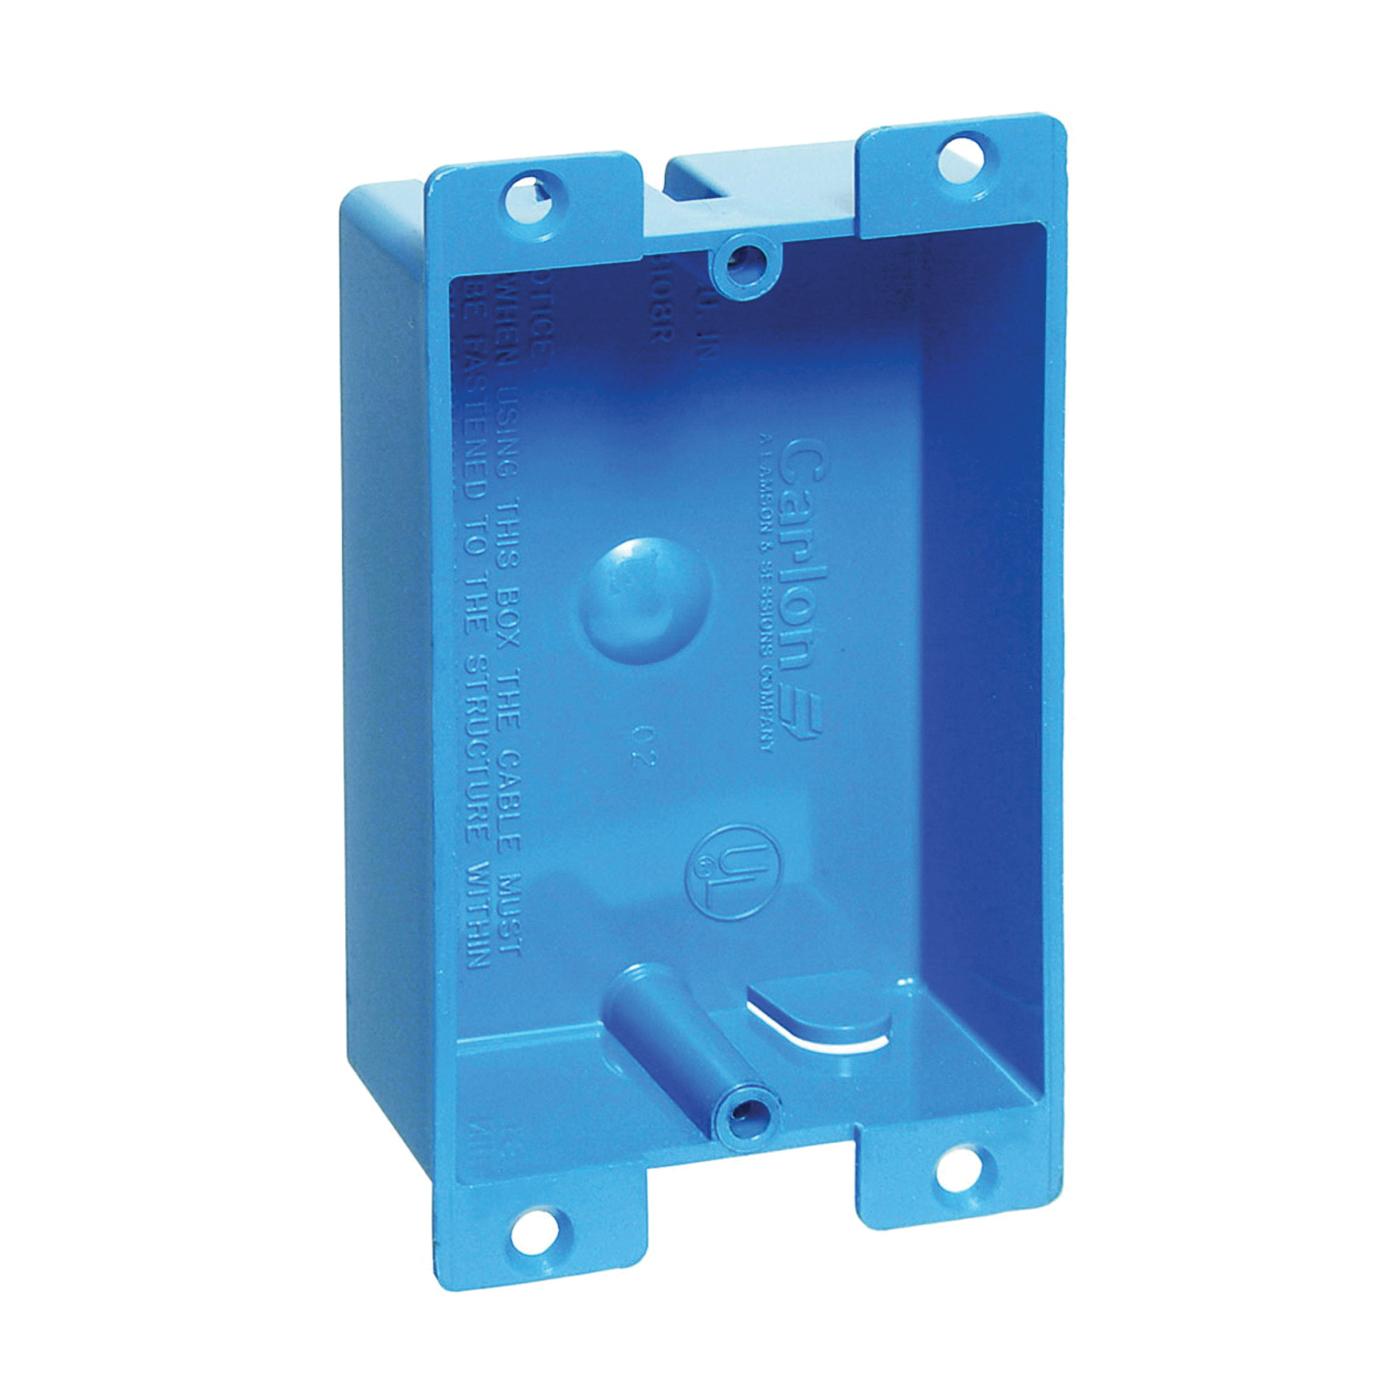 Picture of Carlon B108R-UPC Outlet Box, 1-Gang, PVC, Blue